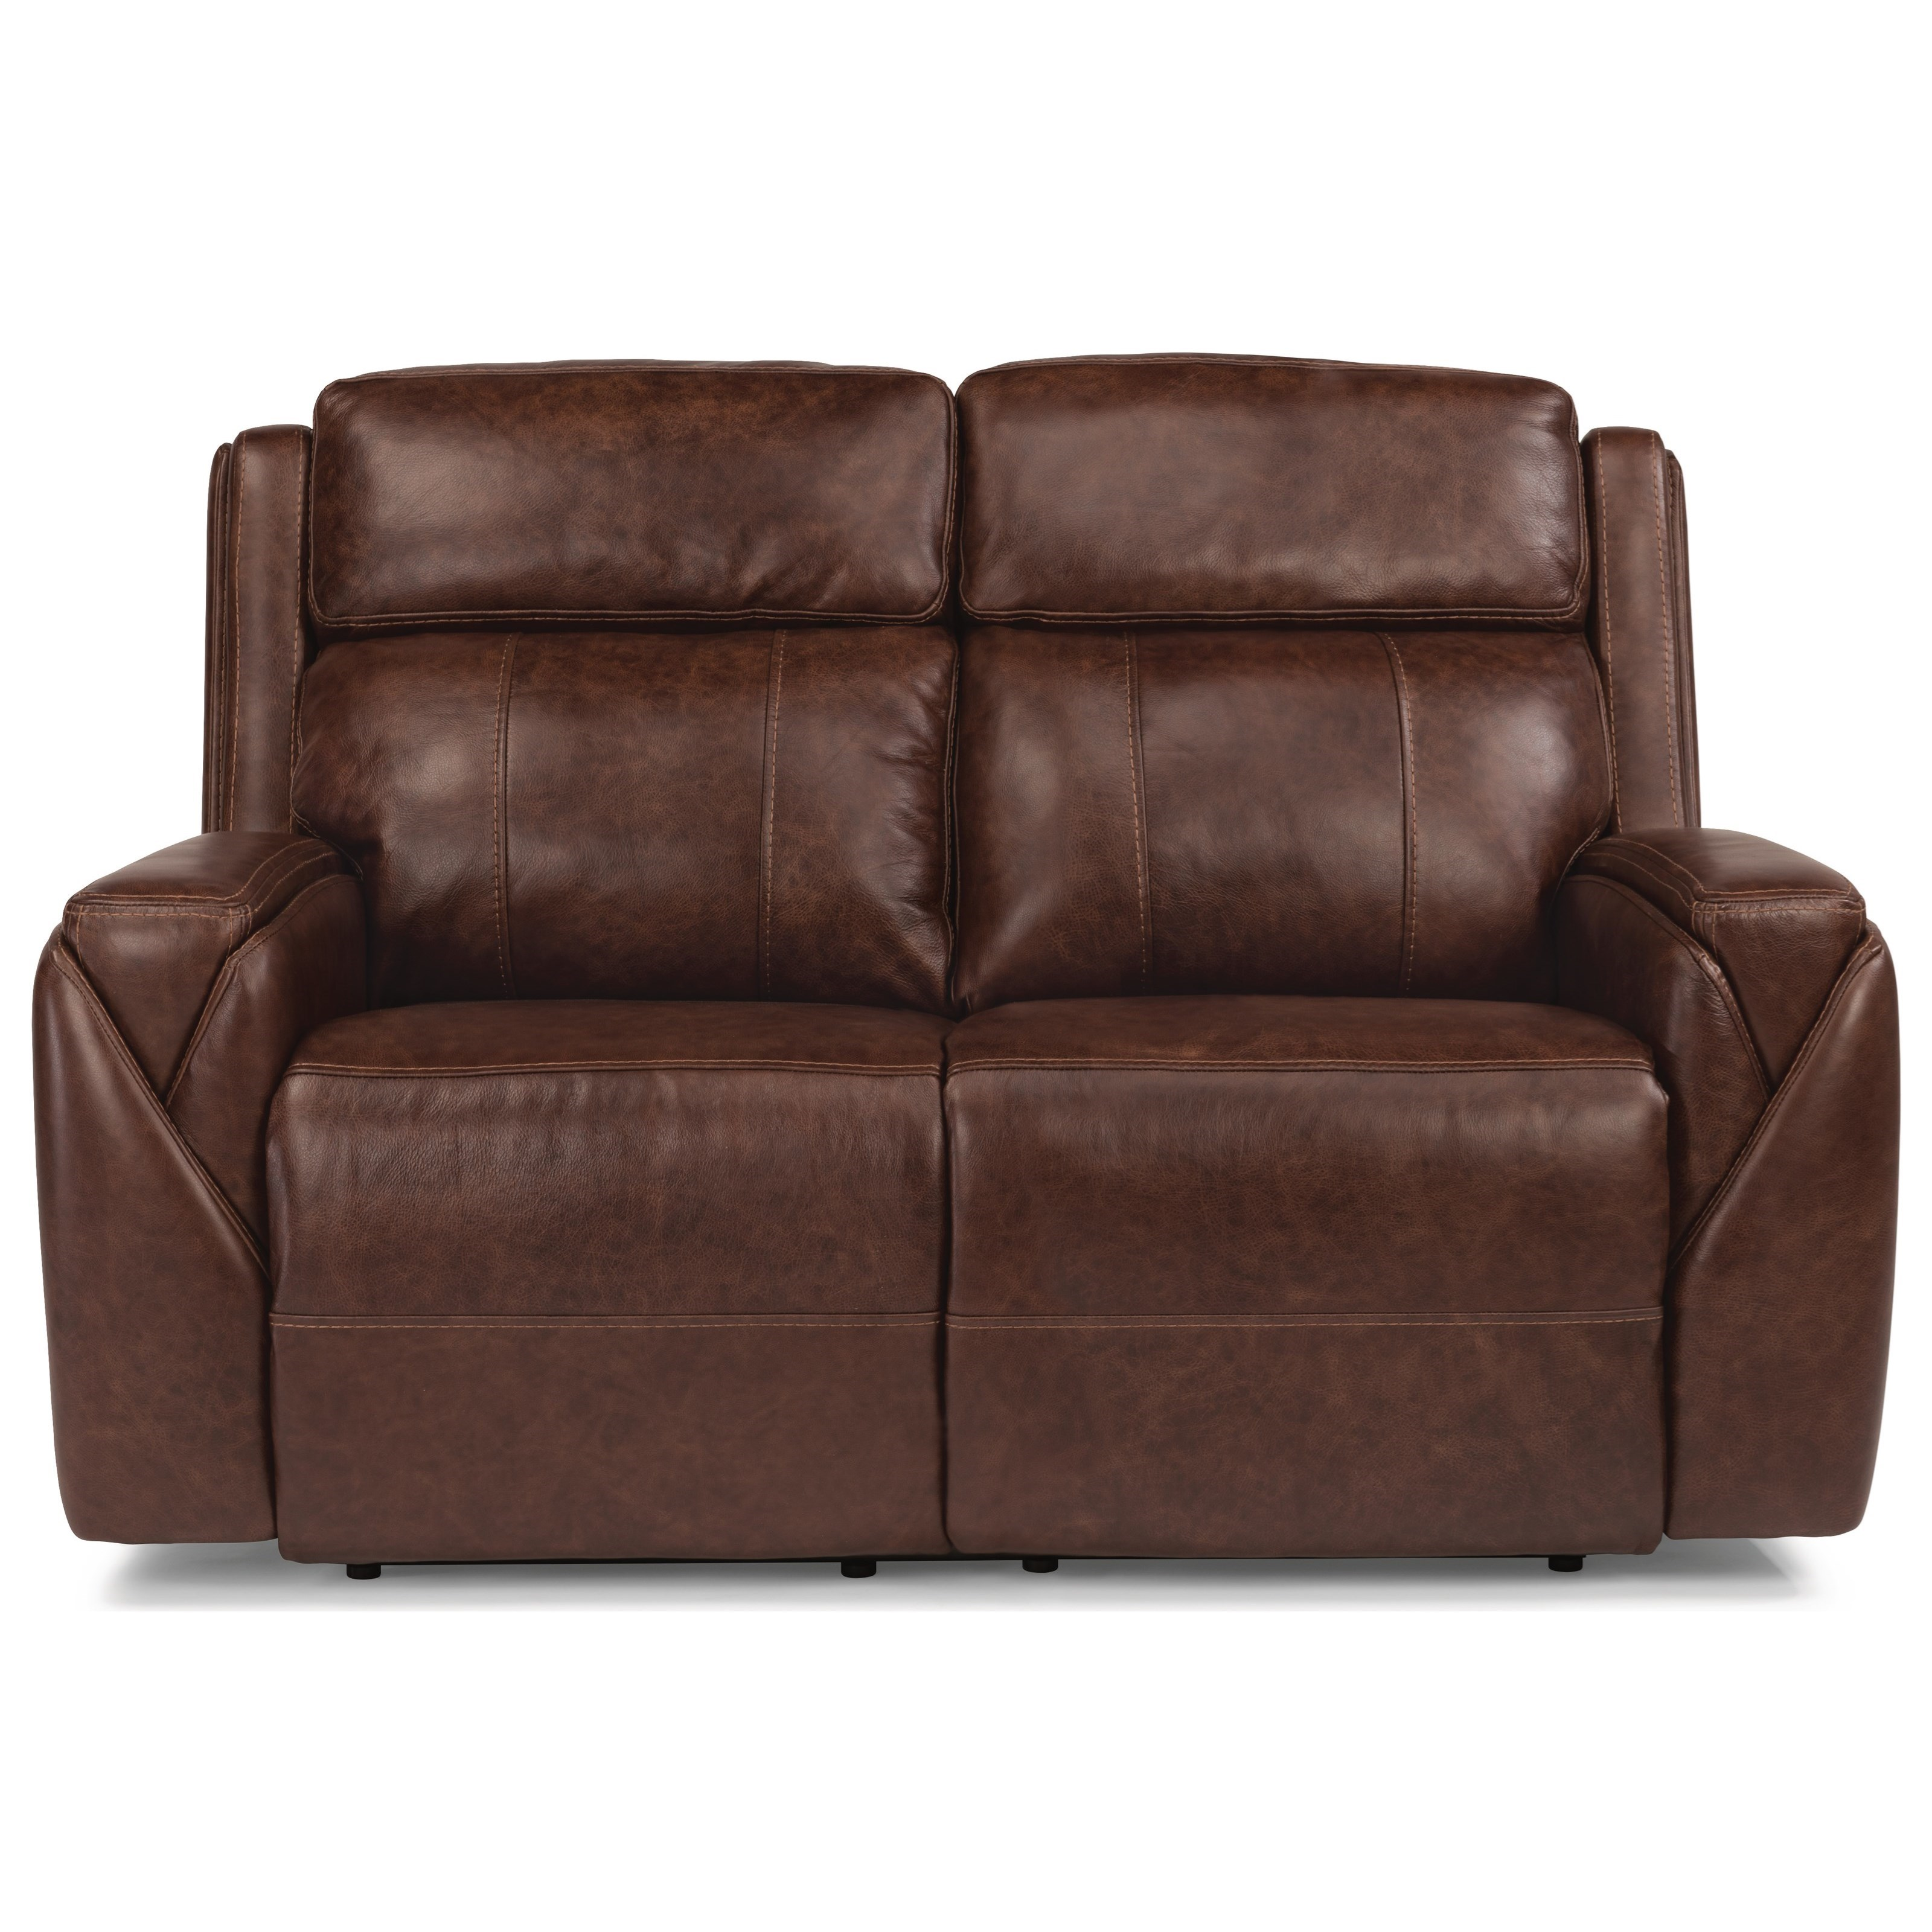 Flexsteel Latitudes-Zara Power Reclining Love Seat - Item Number: 1501-60PH-186-62